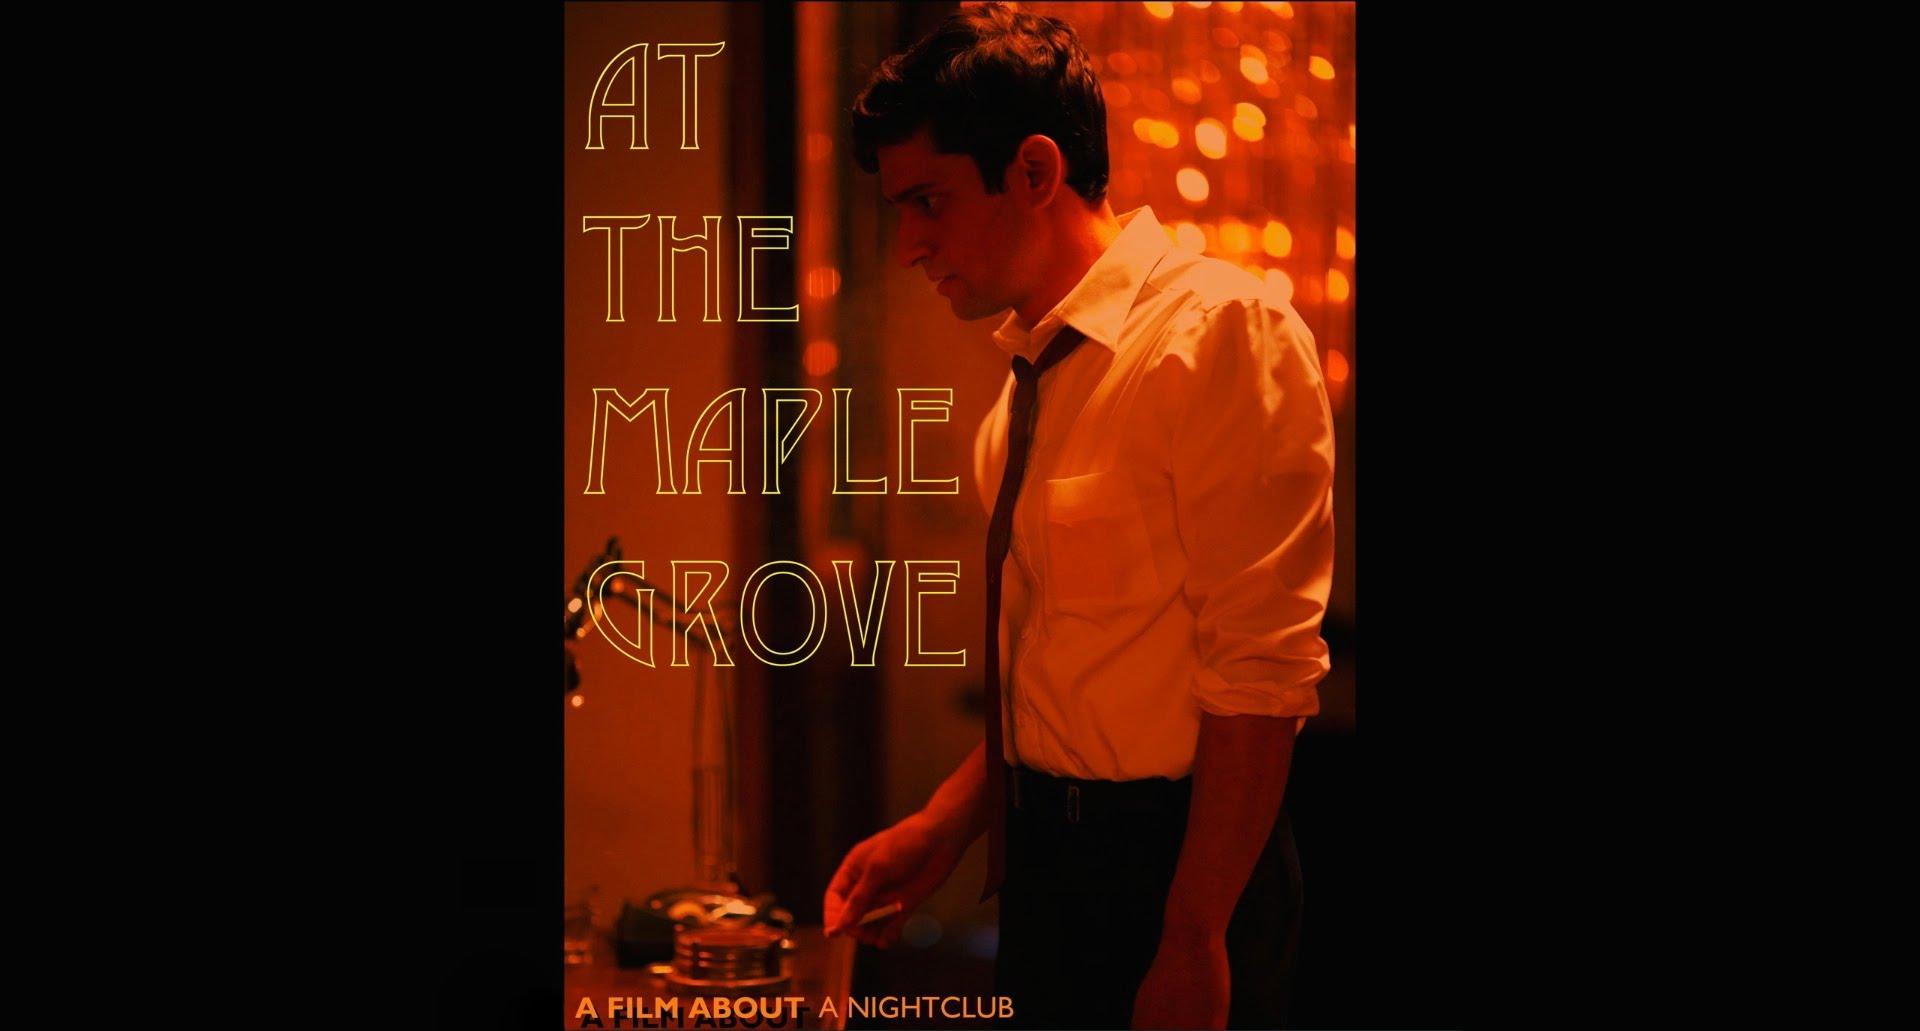 'At The Maple Grove' Teaser Trailer